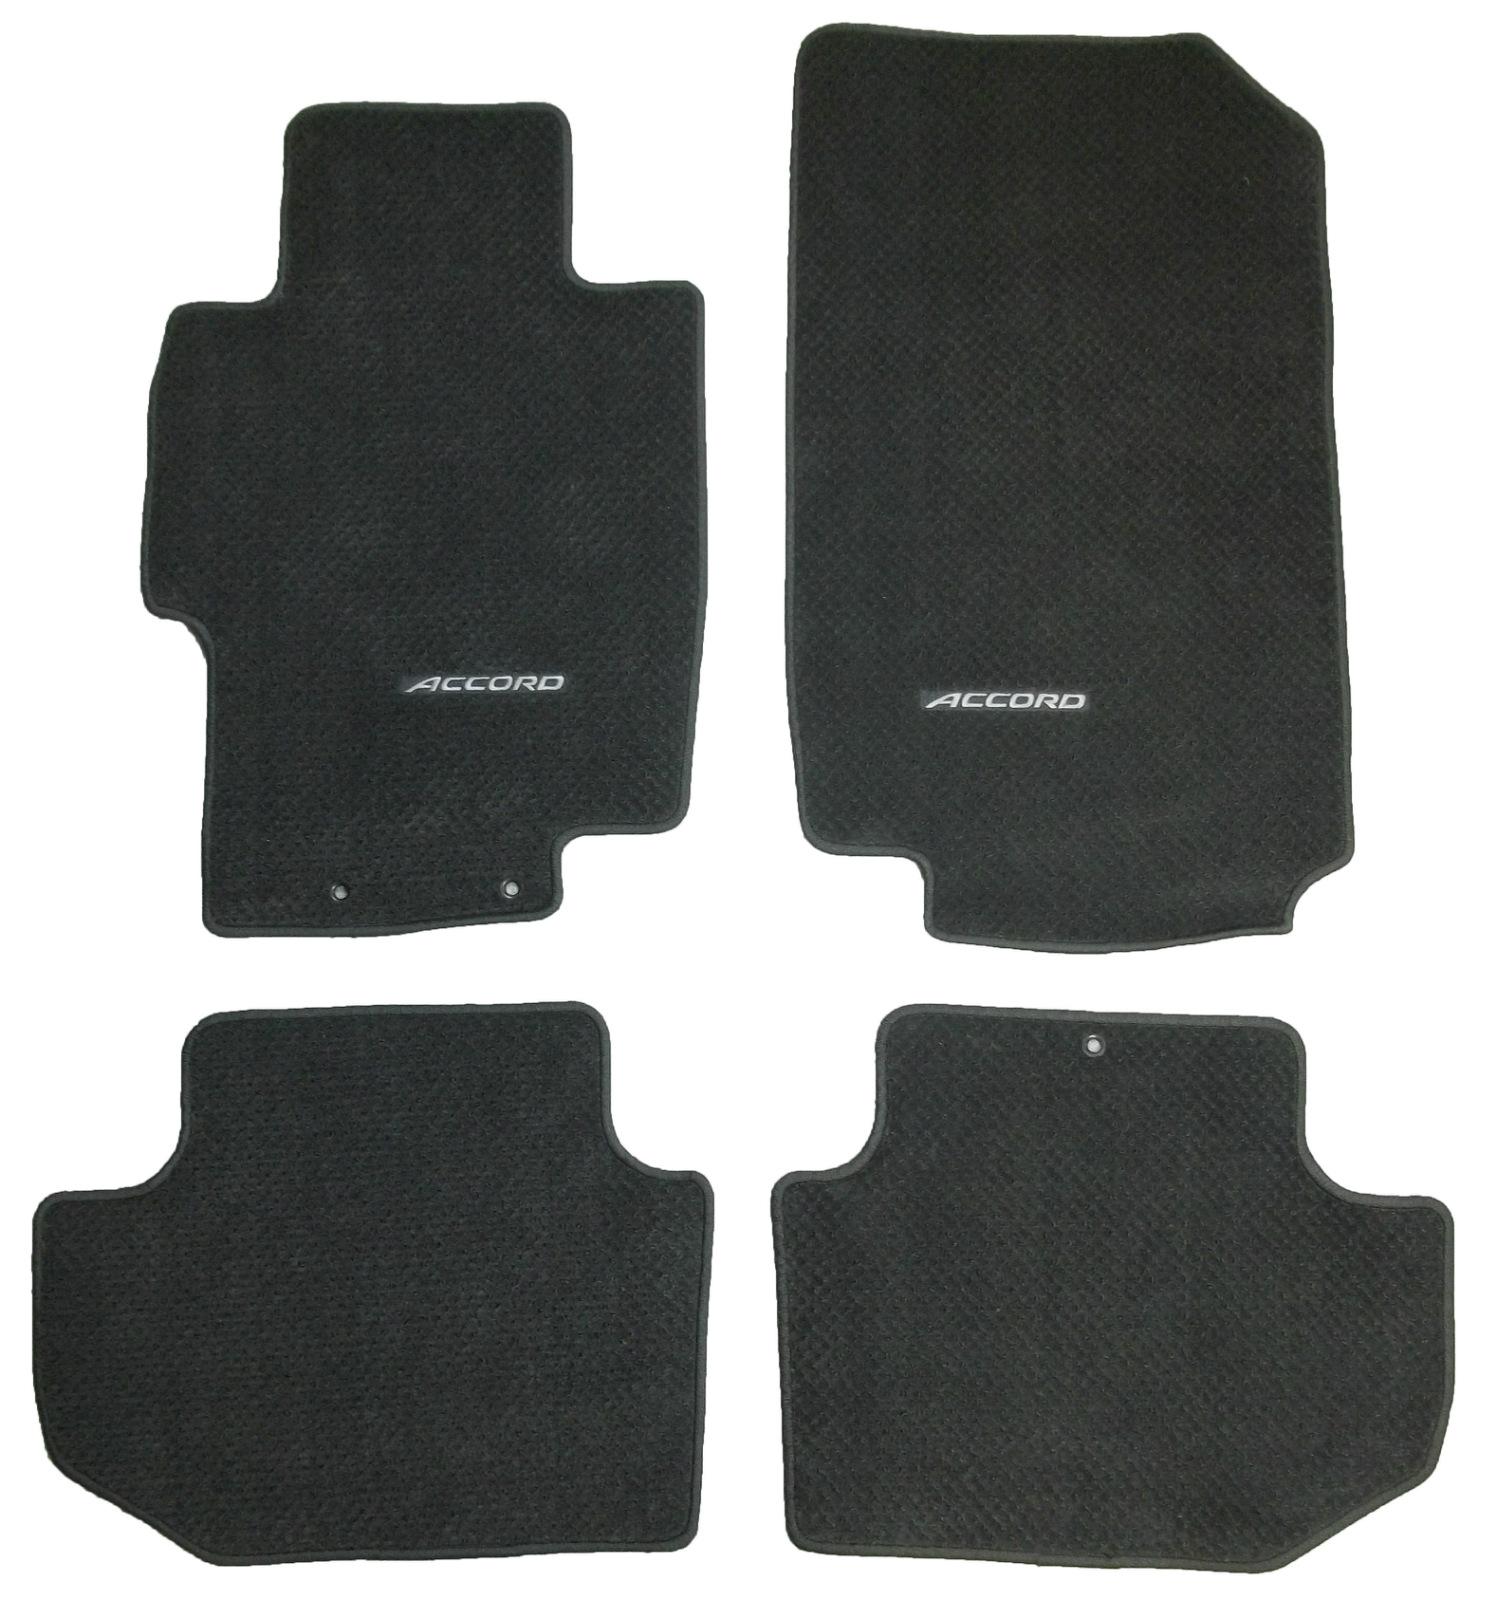 Floor Mats For Honda Accord: Premium OEM Logo Floor Mats Set Dark Charcoal Carpet For